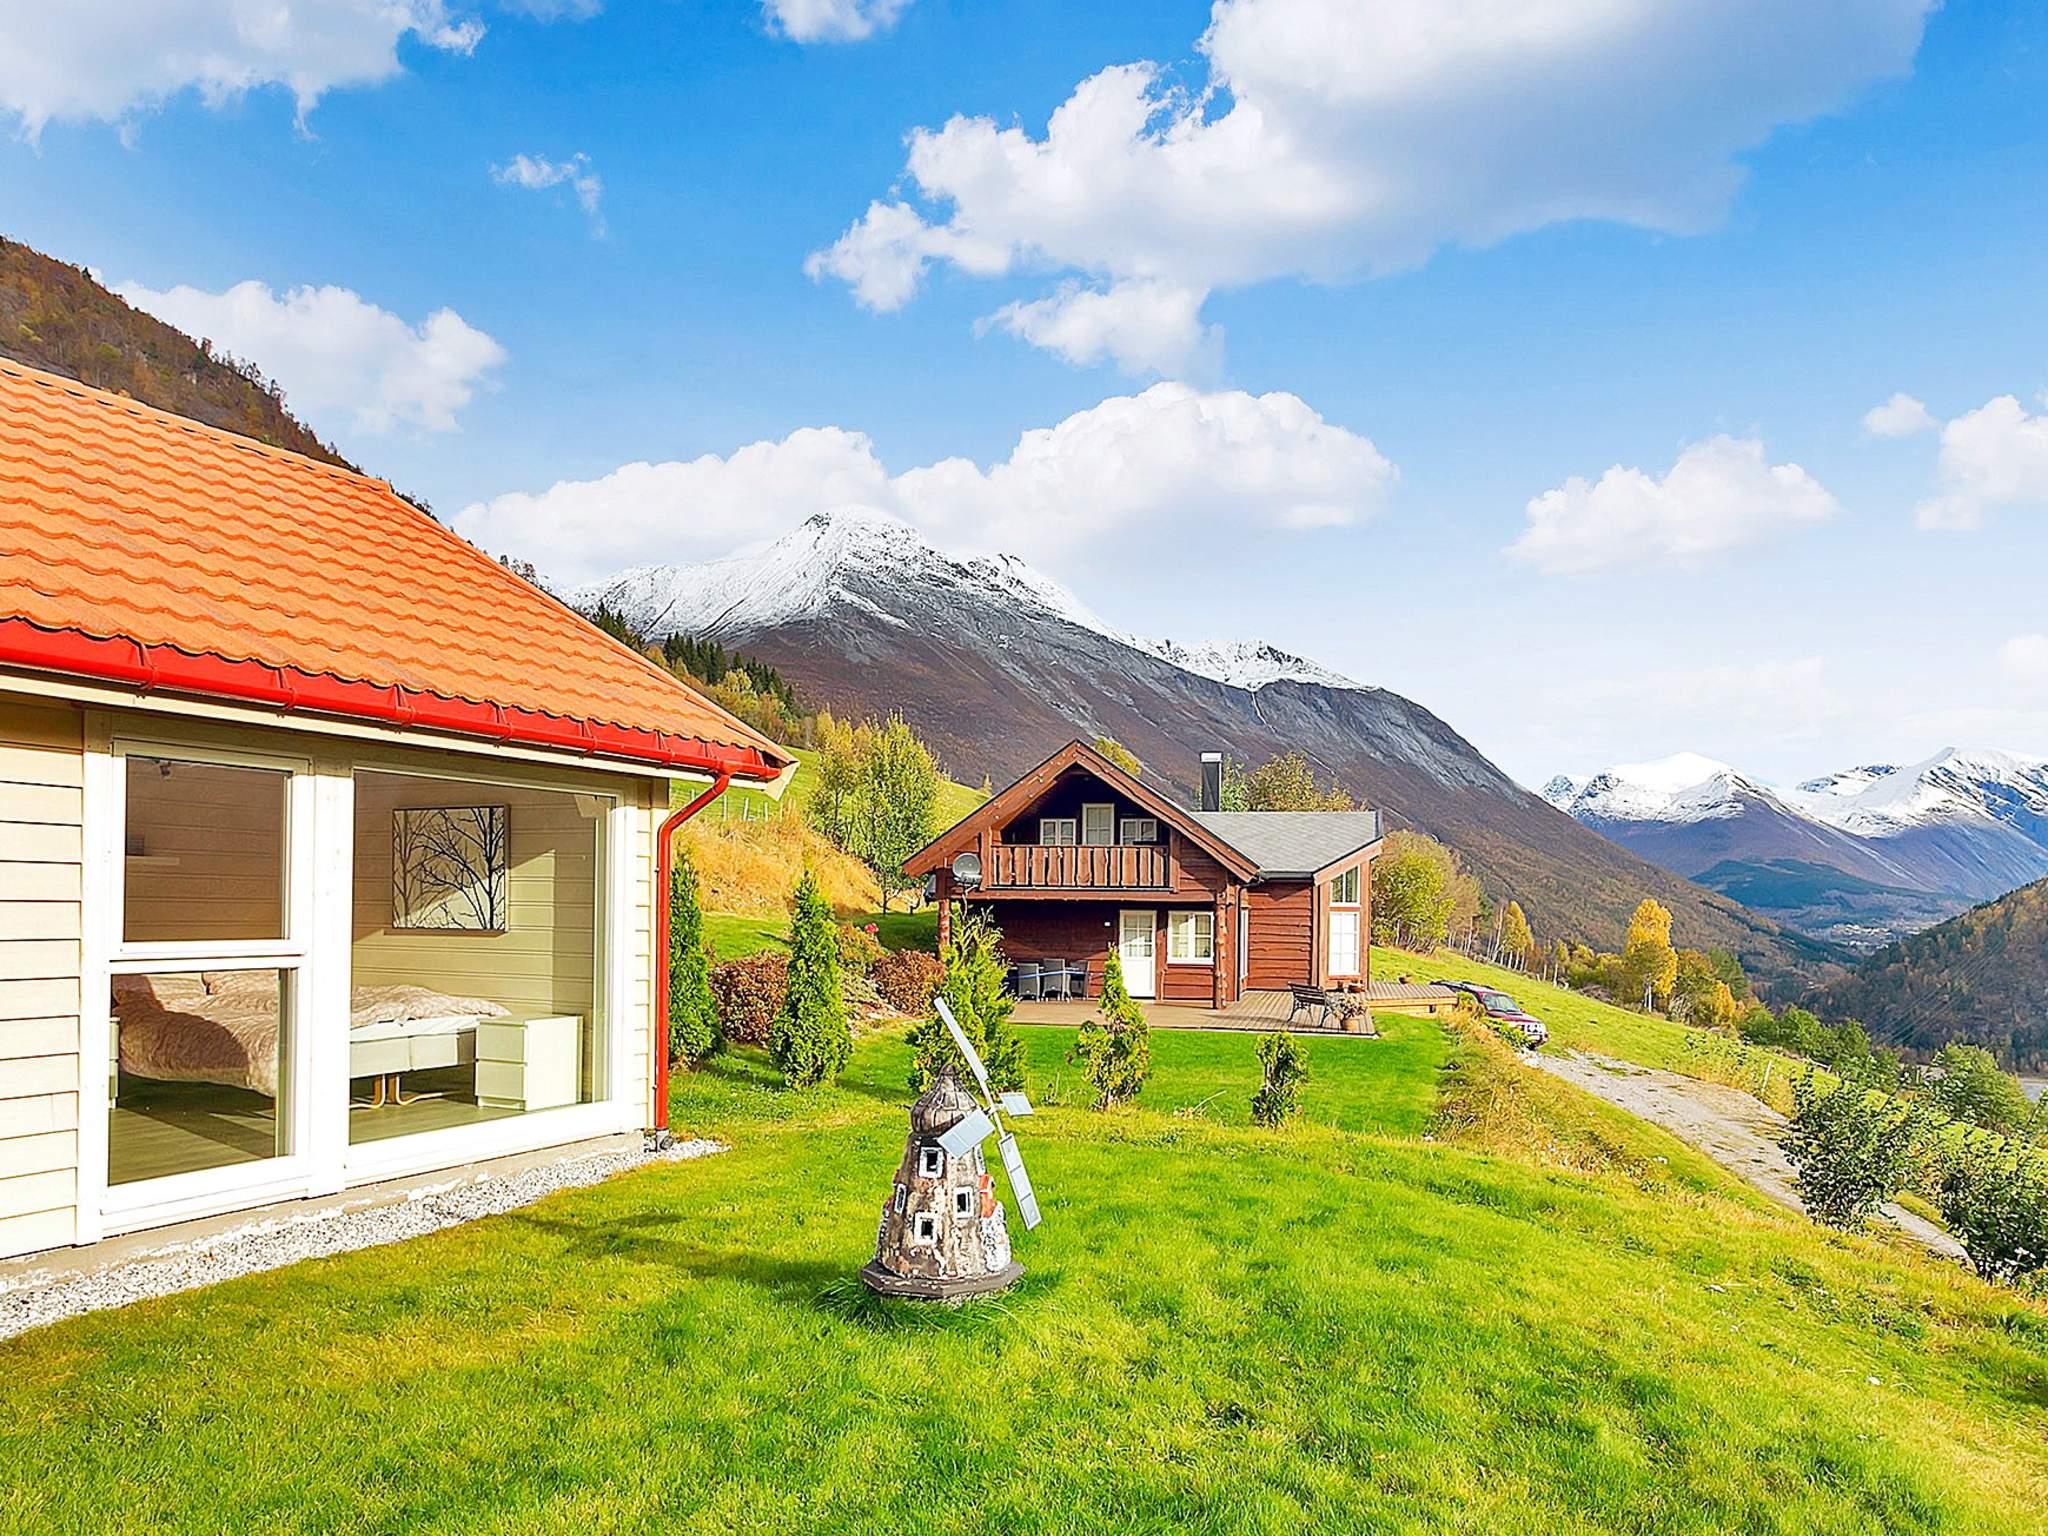 Ferienhaus Lingås (257163), Valldal, More - Romsdal, Westnorwegen, Norwegen, Bild 23